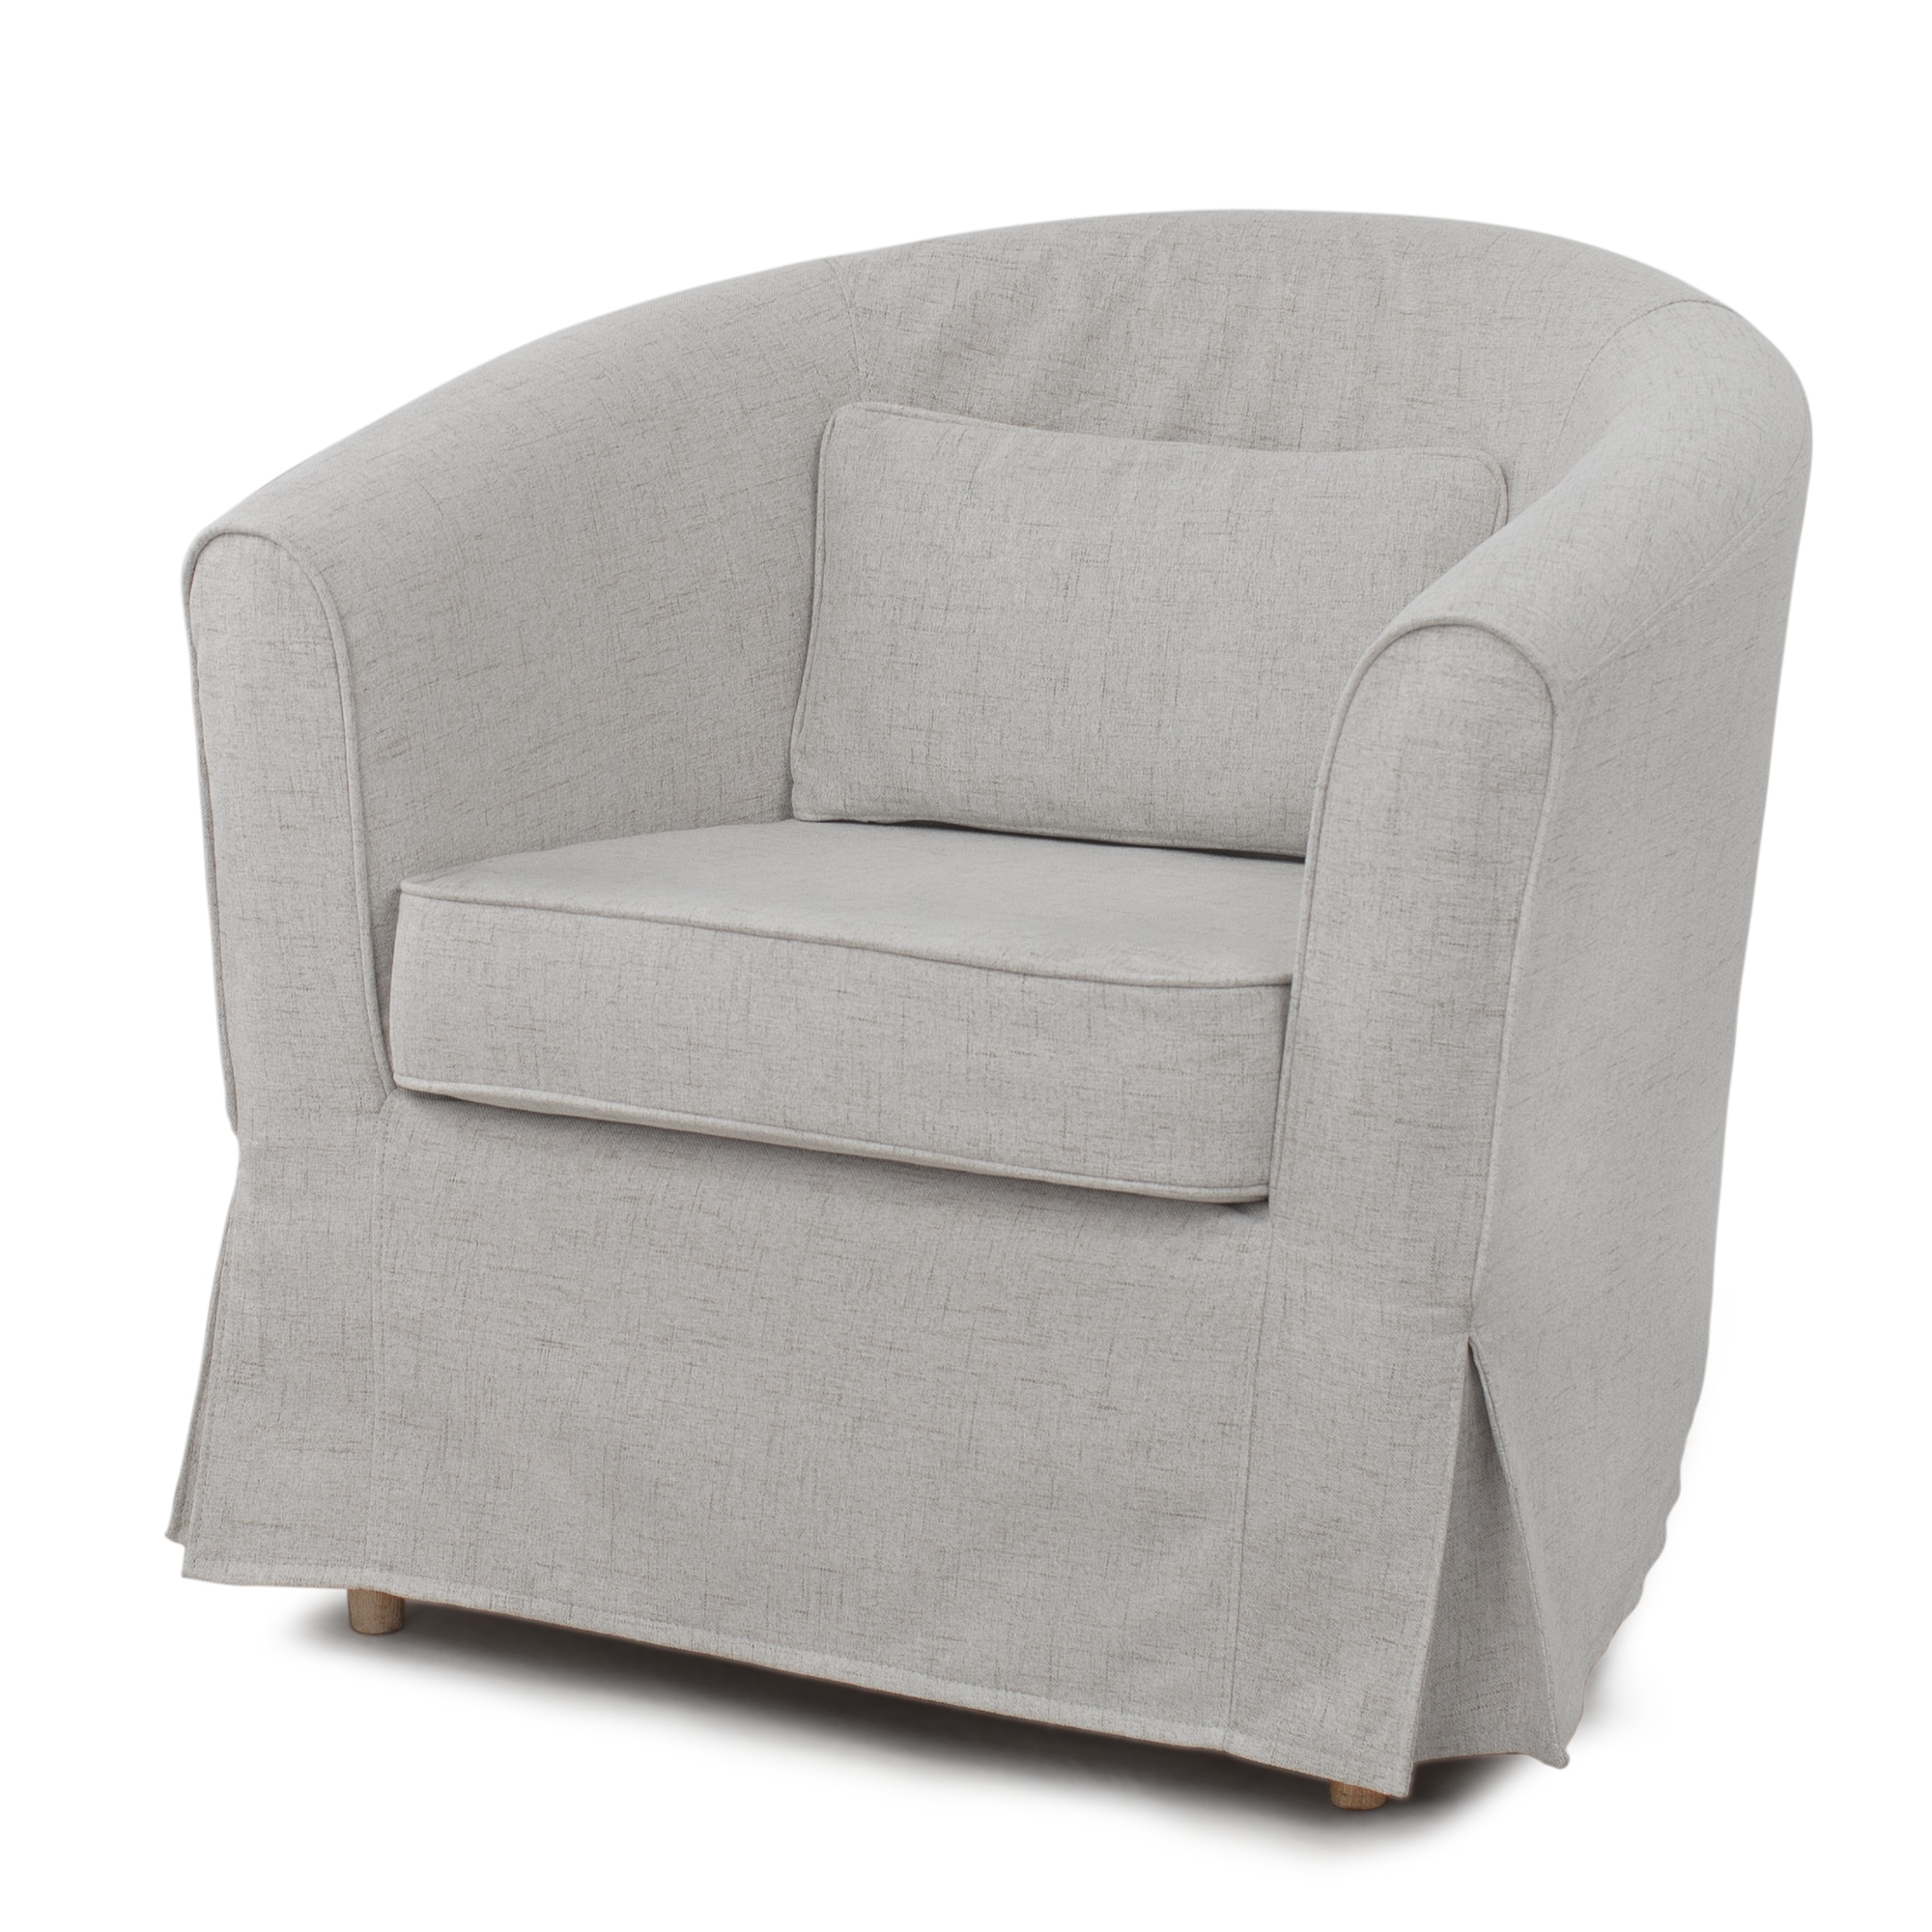 Bezug für Sessel Tullsta